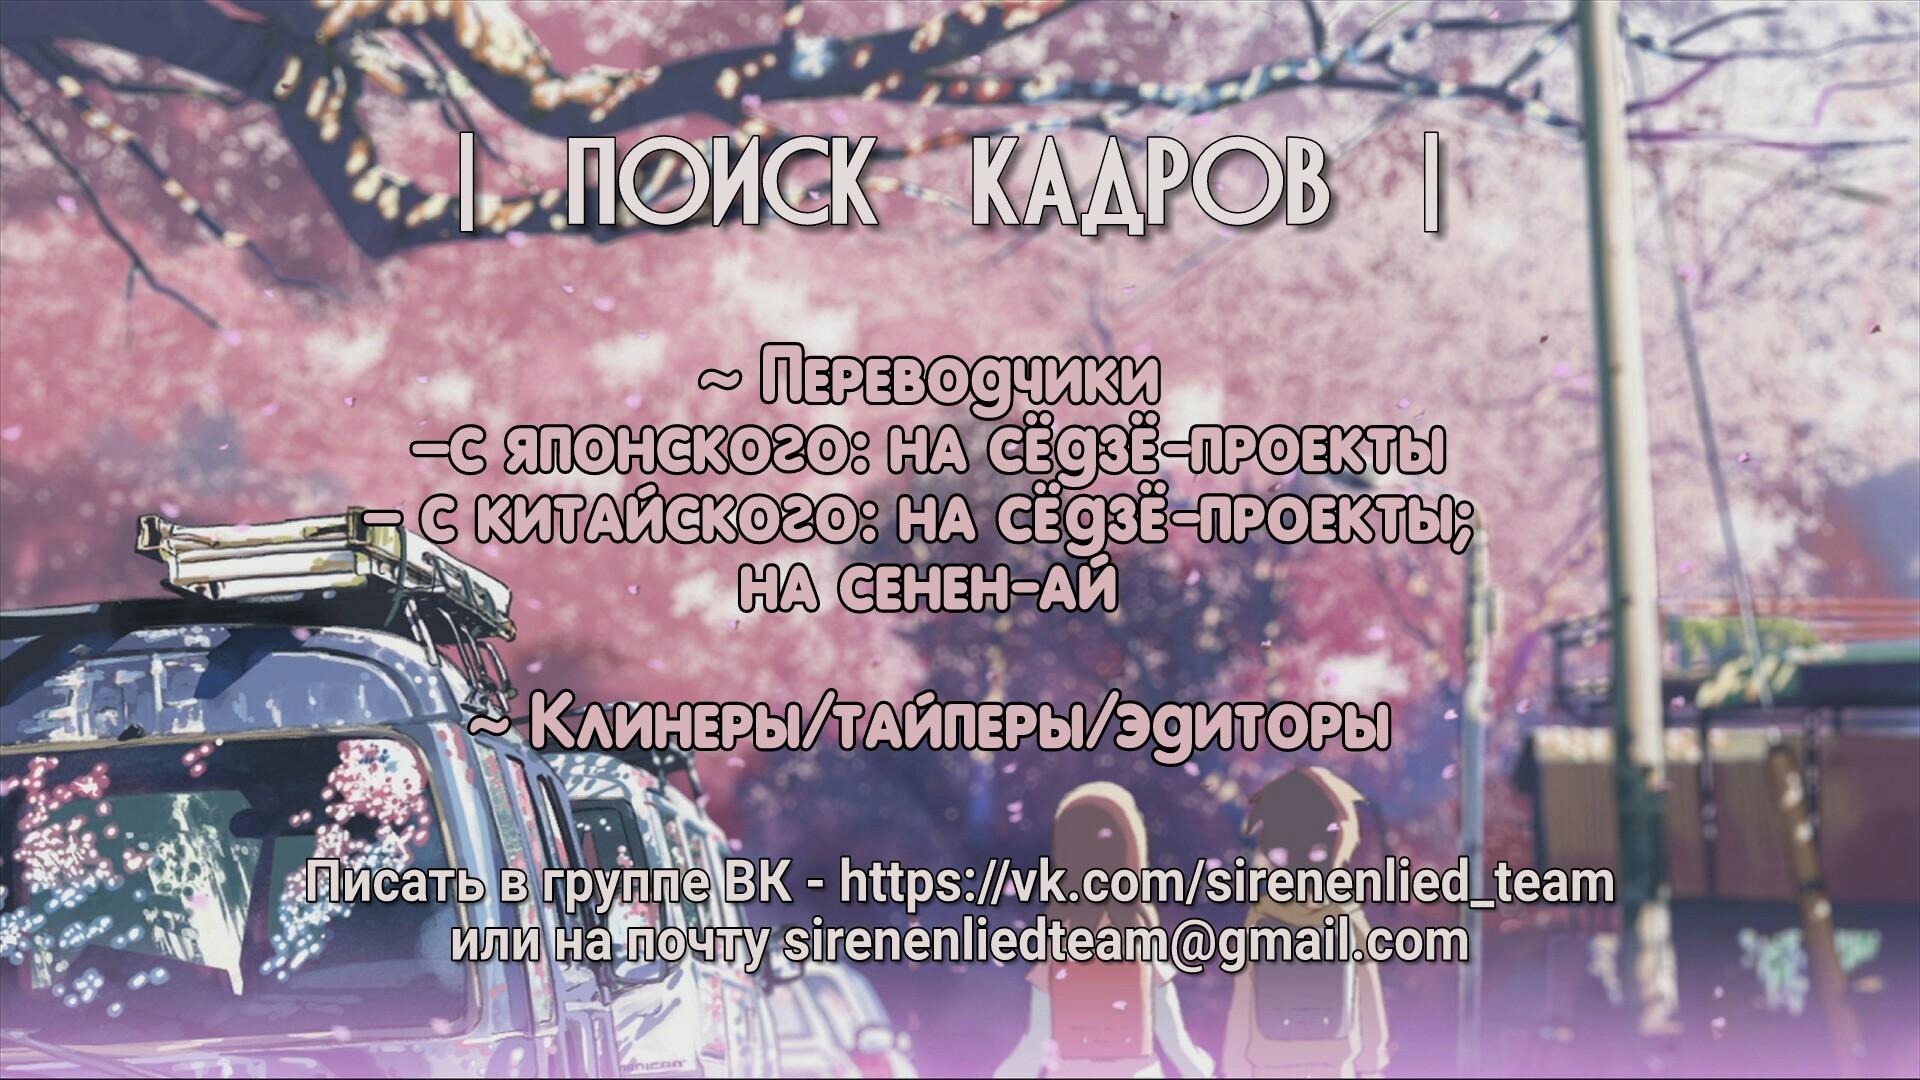 https://r1.ninemanga.com/comics/pic2/27/32027/337031/151033742265.jpg Page 1